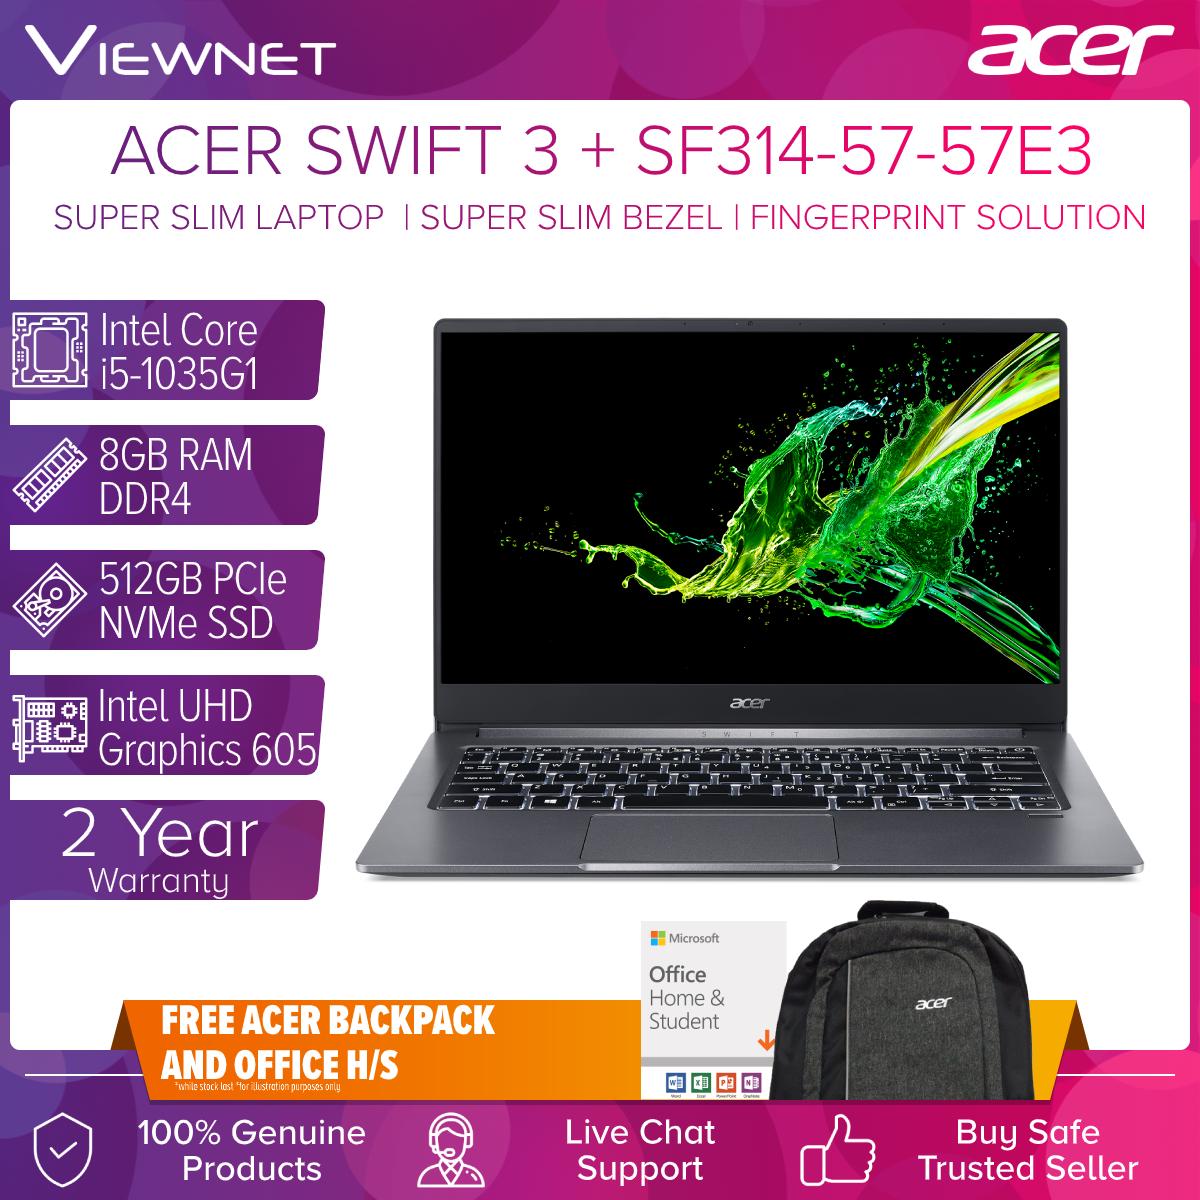 ACER SWIFT 3 LAPTOP SF314-57-5549 / SF314-57-50TR / SF314-57-57E3 : INTEL CORE I5 1035G1/8GB DDR4/512GB SSD/INTEL HD/W10/14